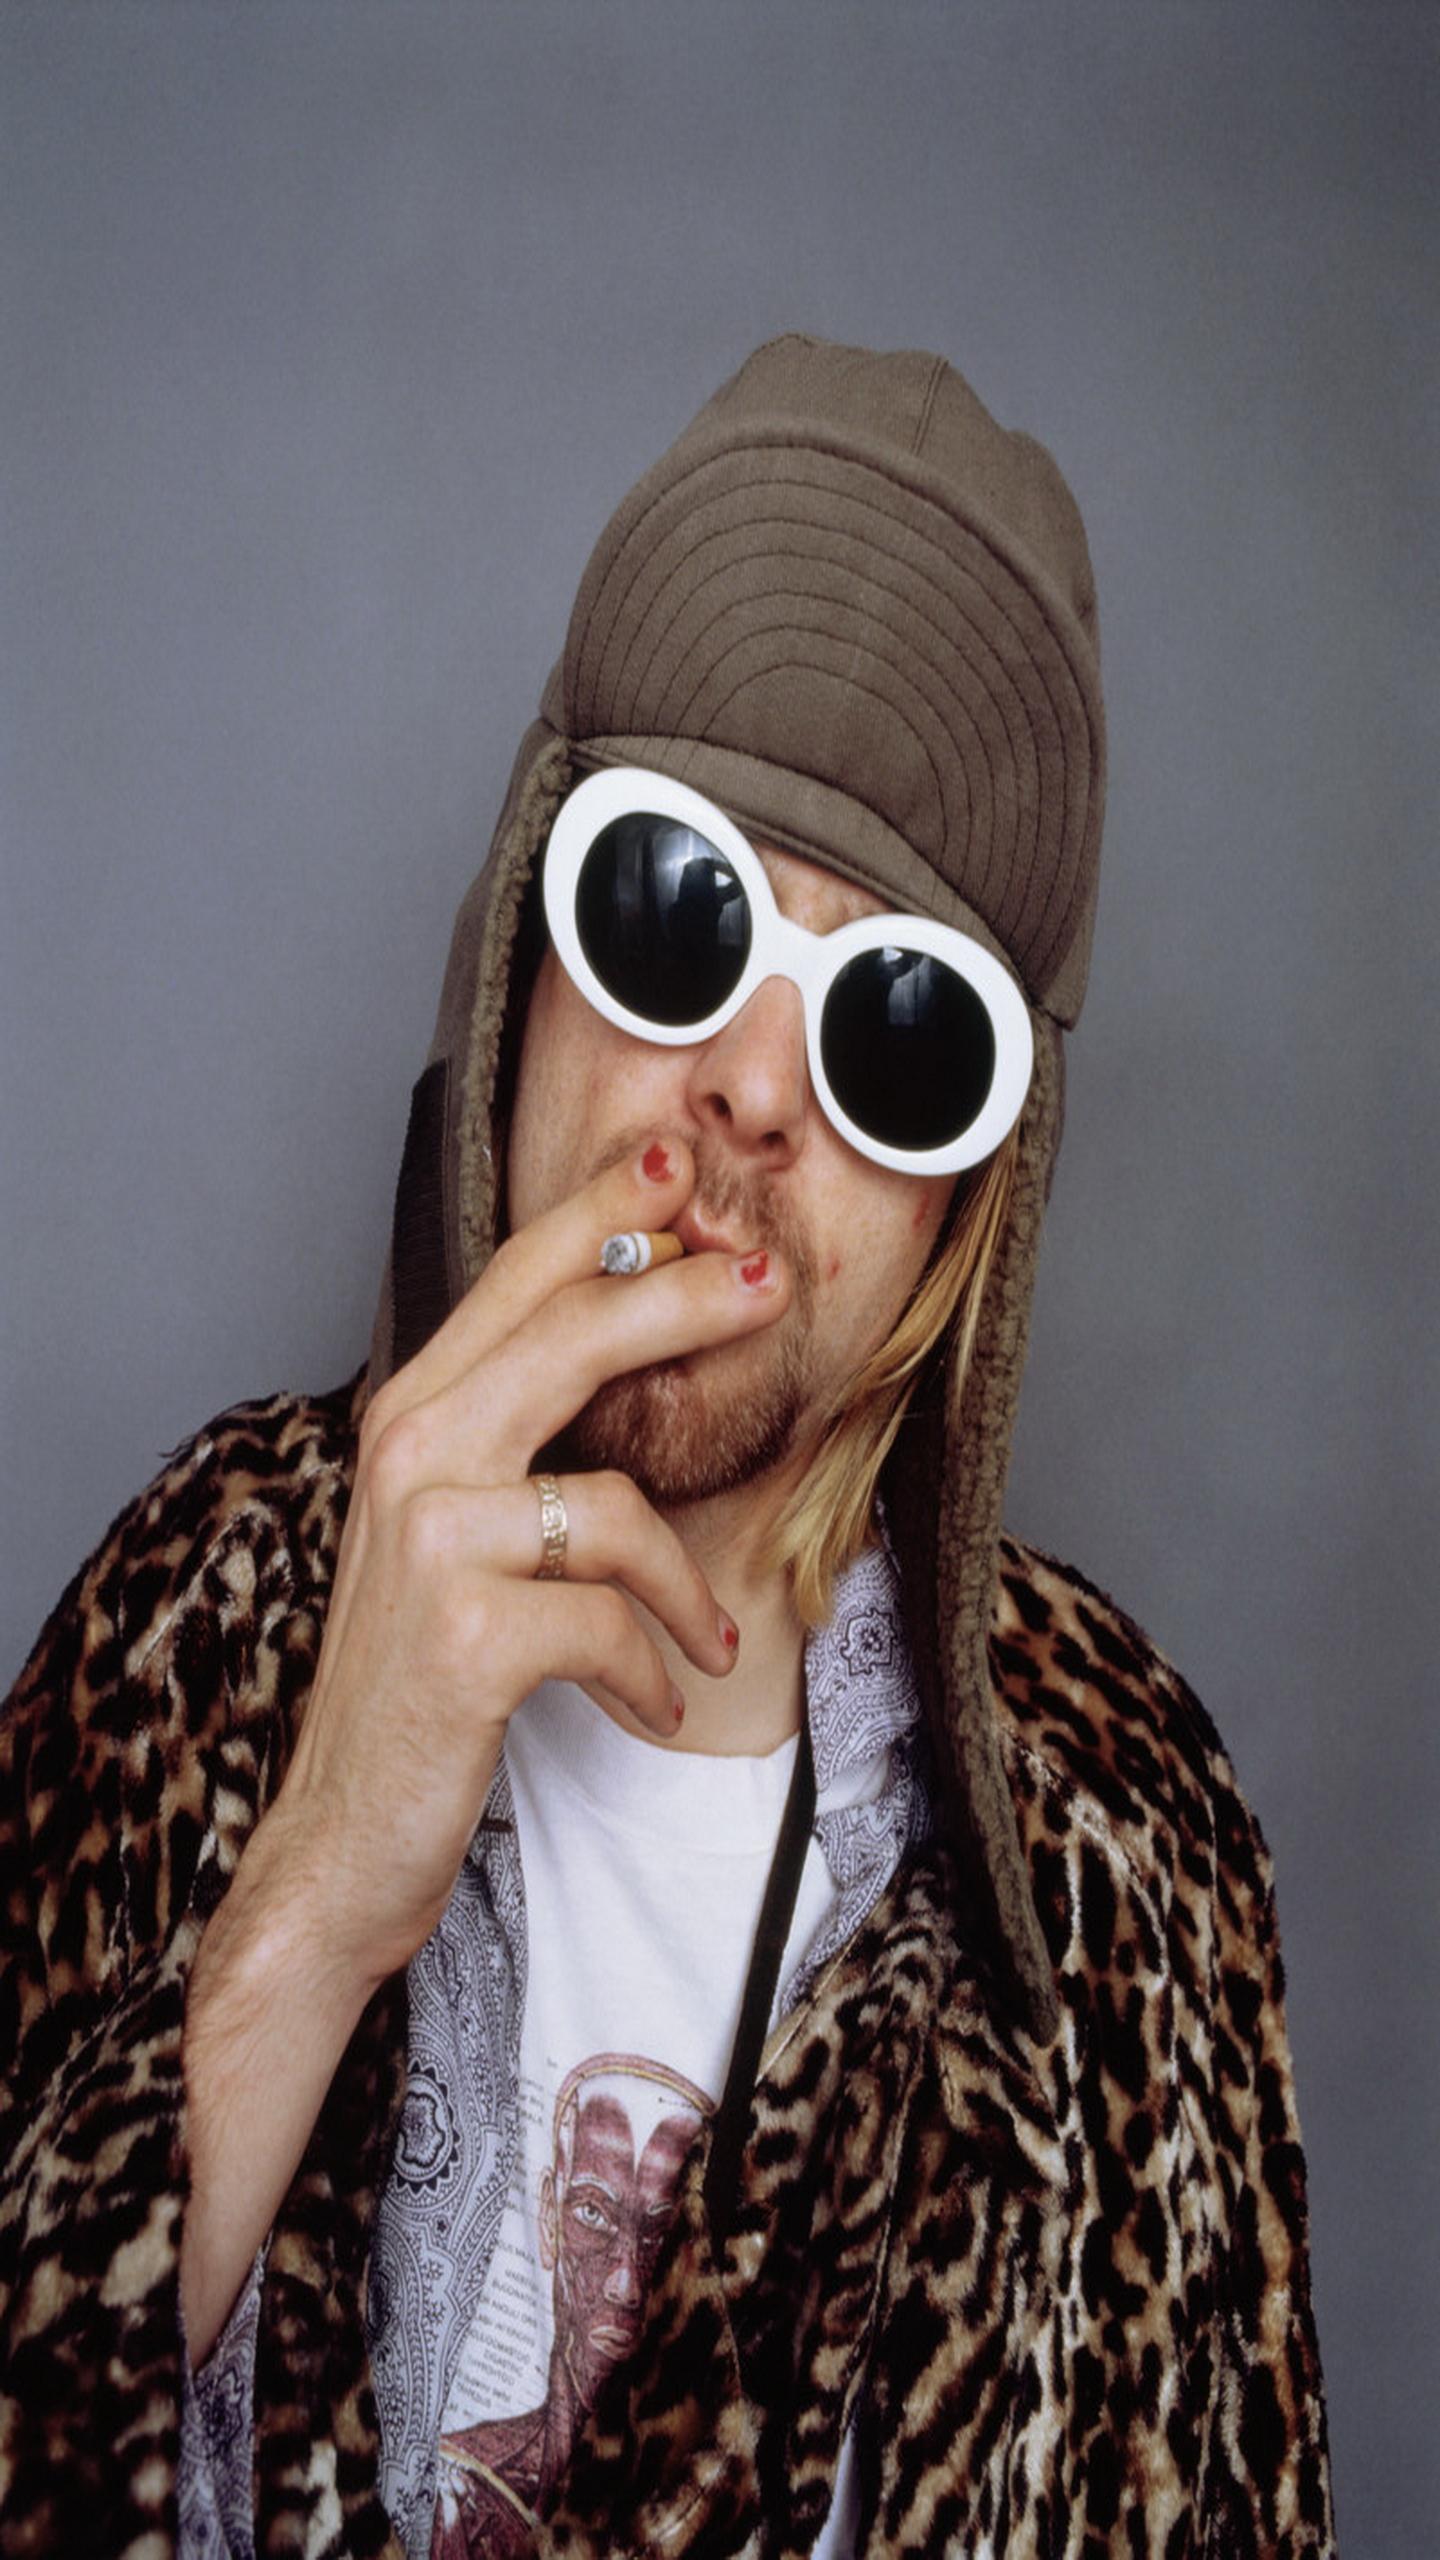 42 kurt cobain hd wallpaper on wallpapersafari - Kurt cobain nirvana wallpaper ...